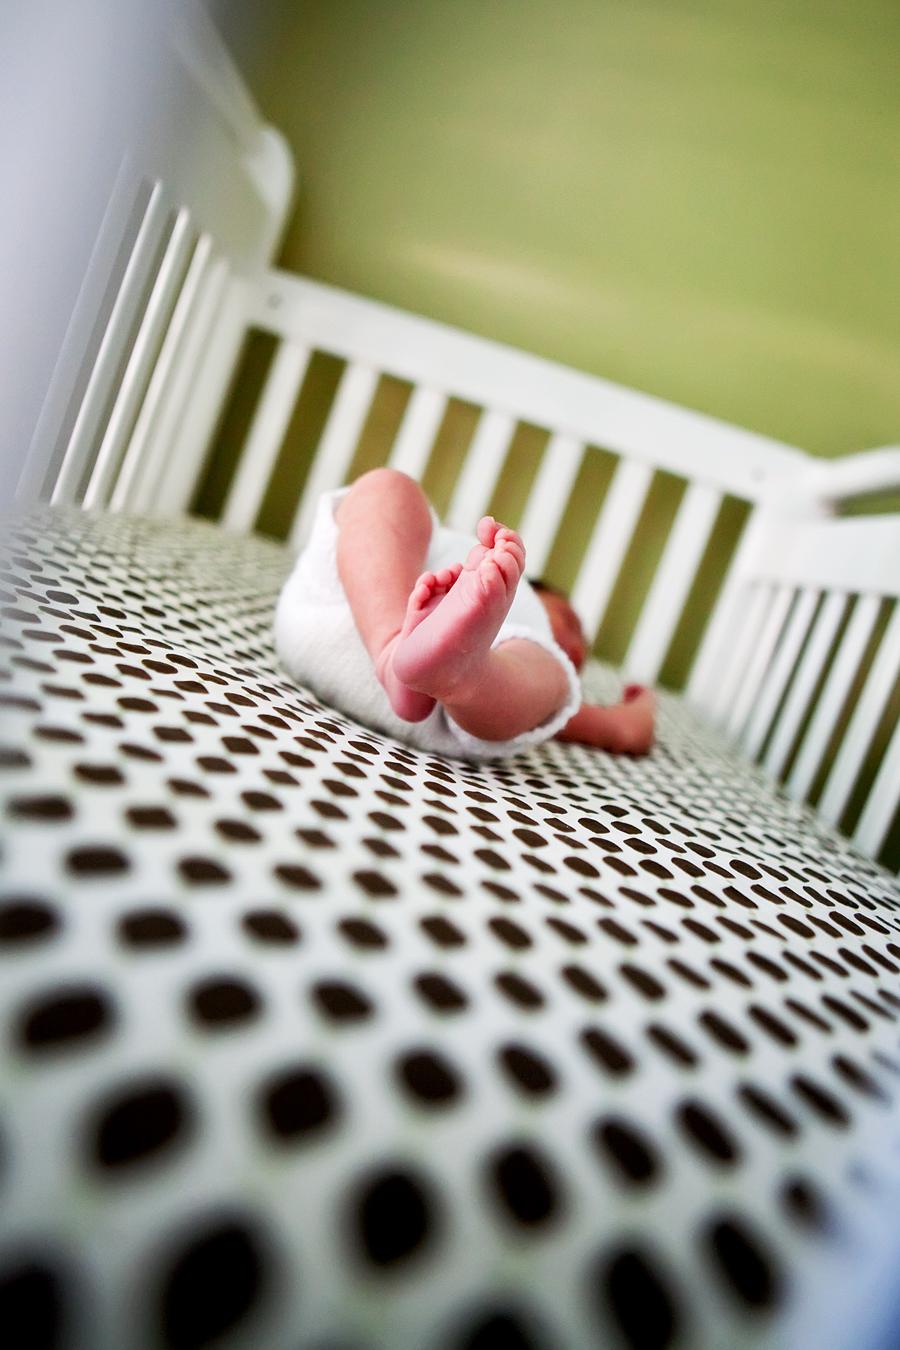 austin_texas_newborn_photographer_34.jpg